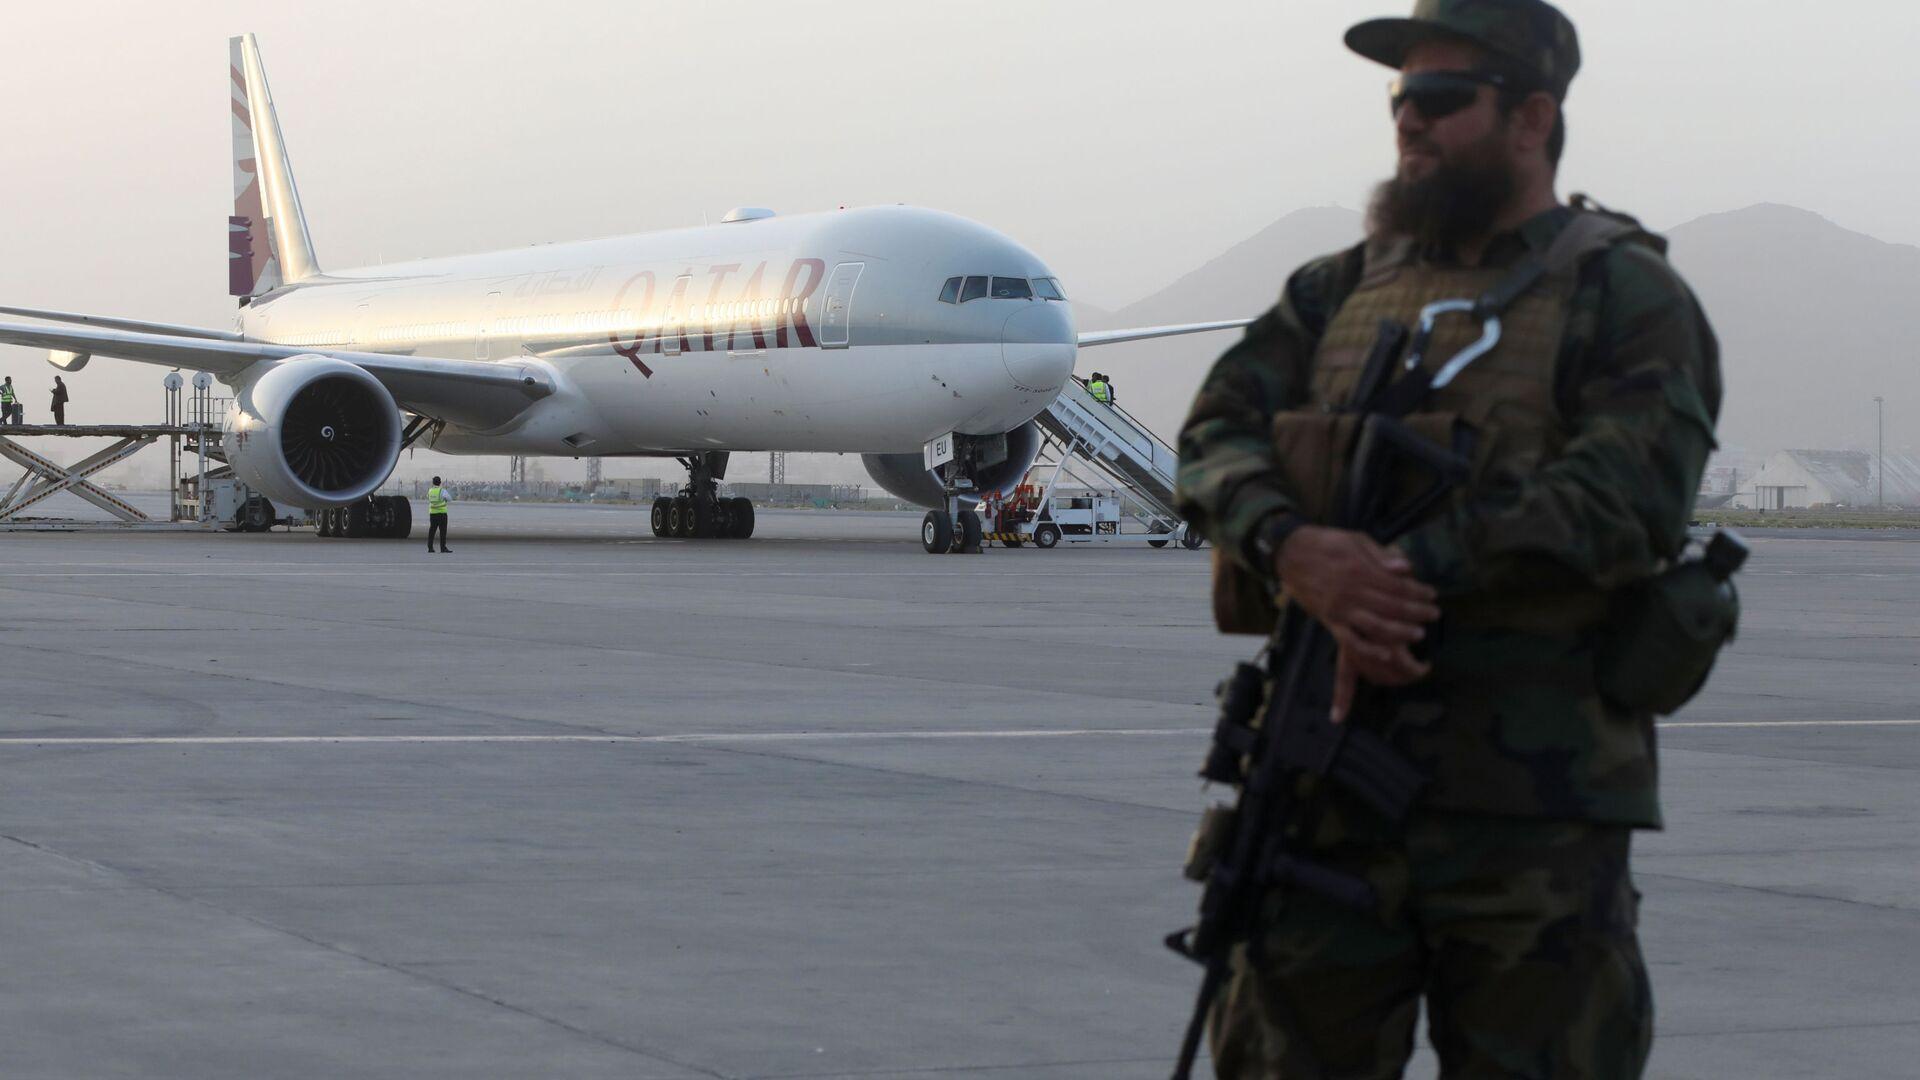 Bojownik talibski na lotnisku w Kabulu, Afganistan - Sputnik Polska, 1920, 13.09.2021